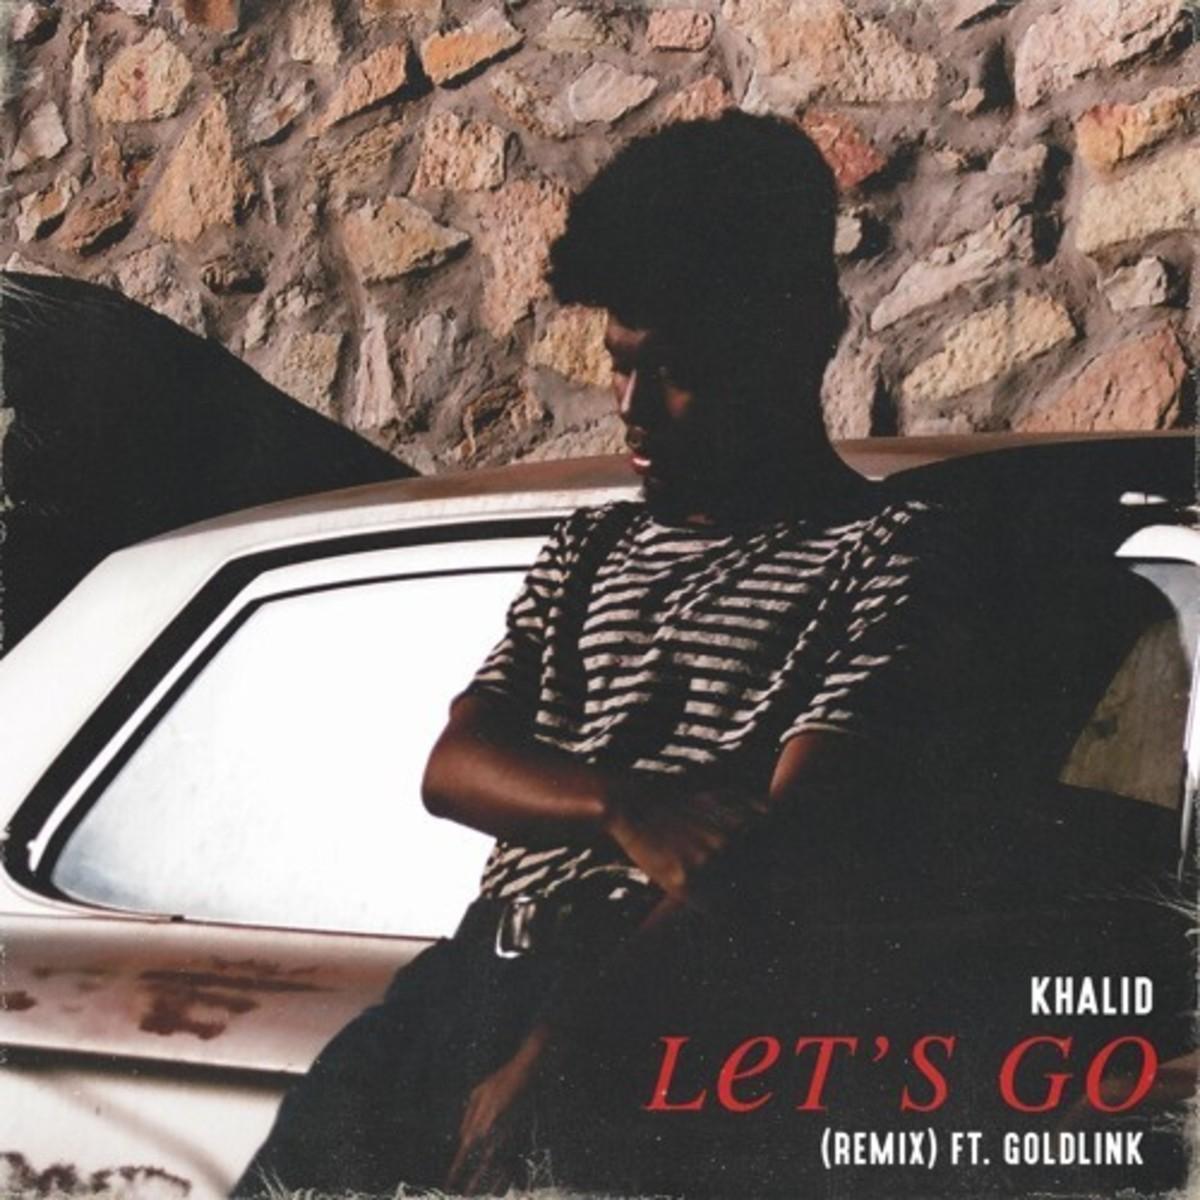 khalid-lets-go-remix.jpg